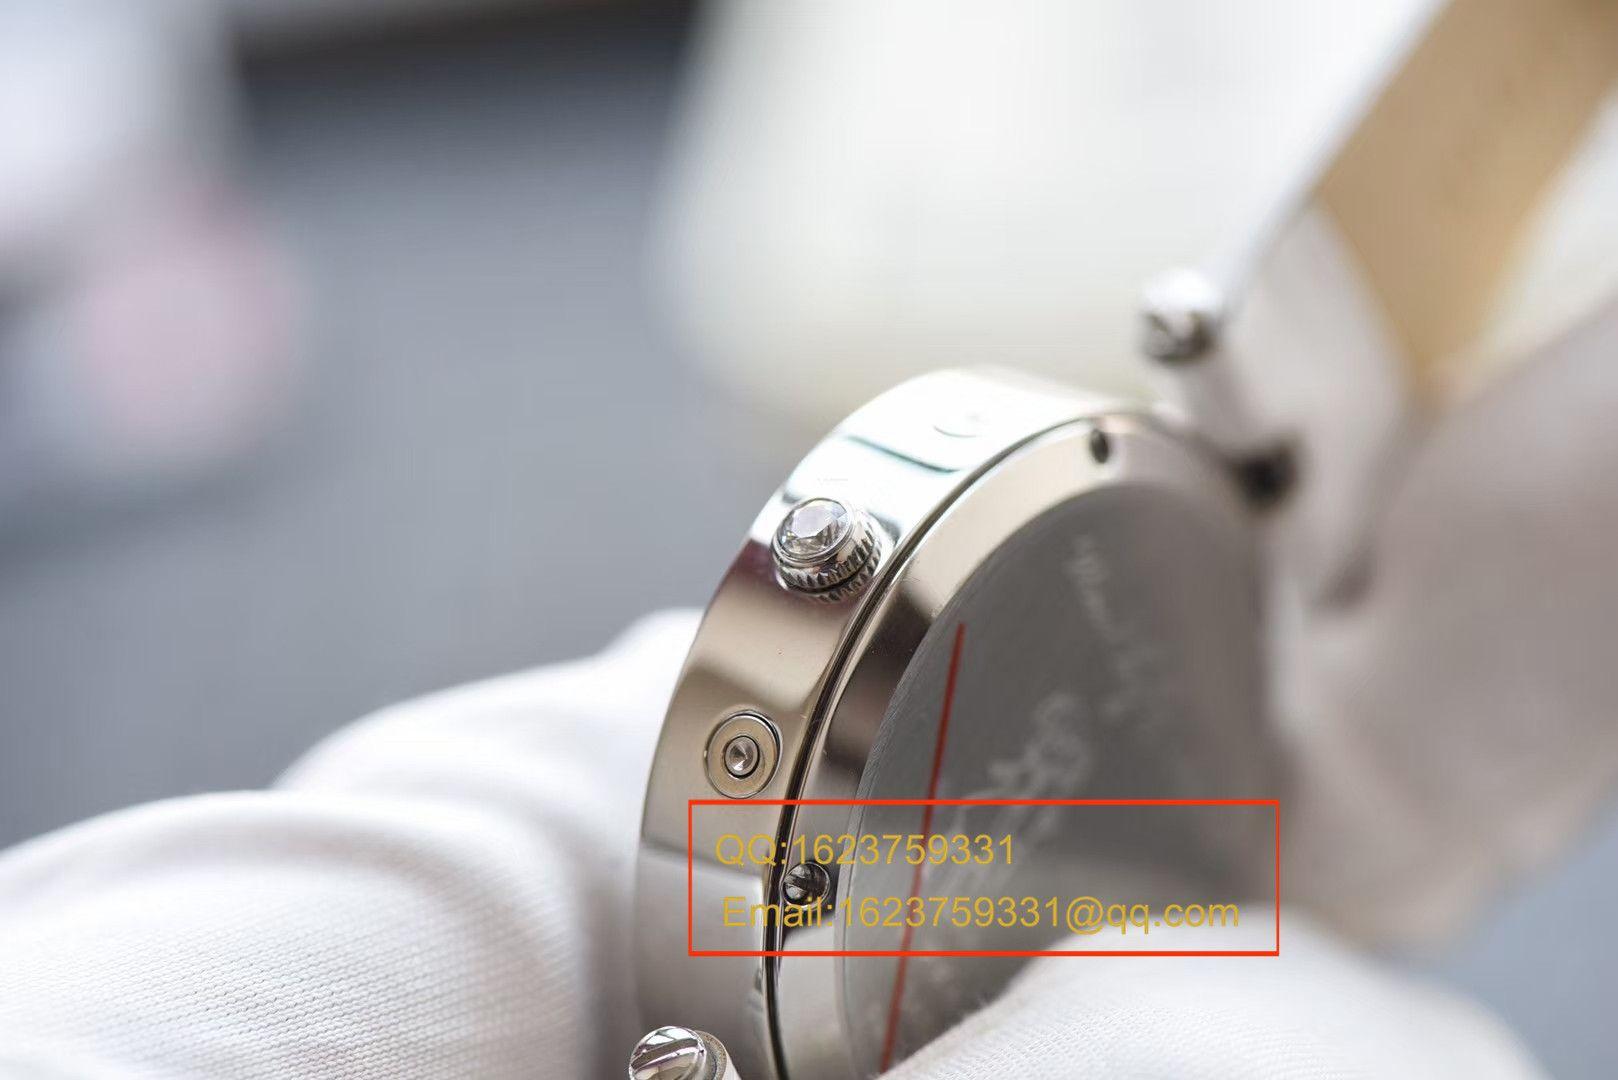 Van Cleef & Arpels梵克雅宝诗意复杂功能腕表系列VCARN9VI00腕表 / 梵克雅宝 VCA01